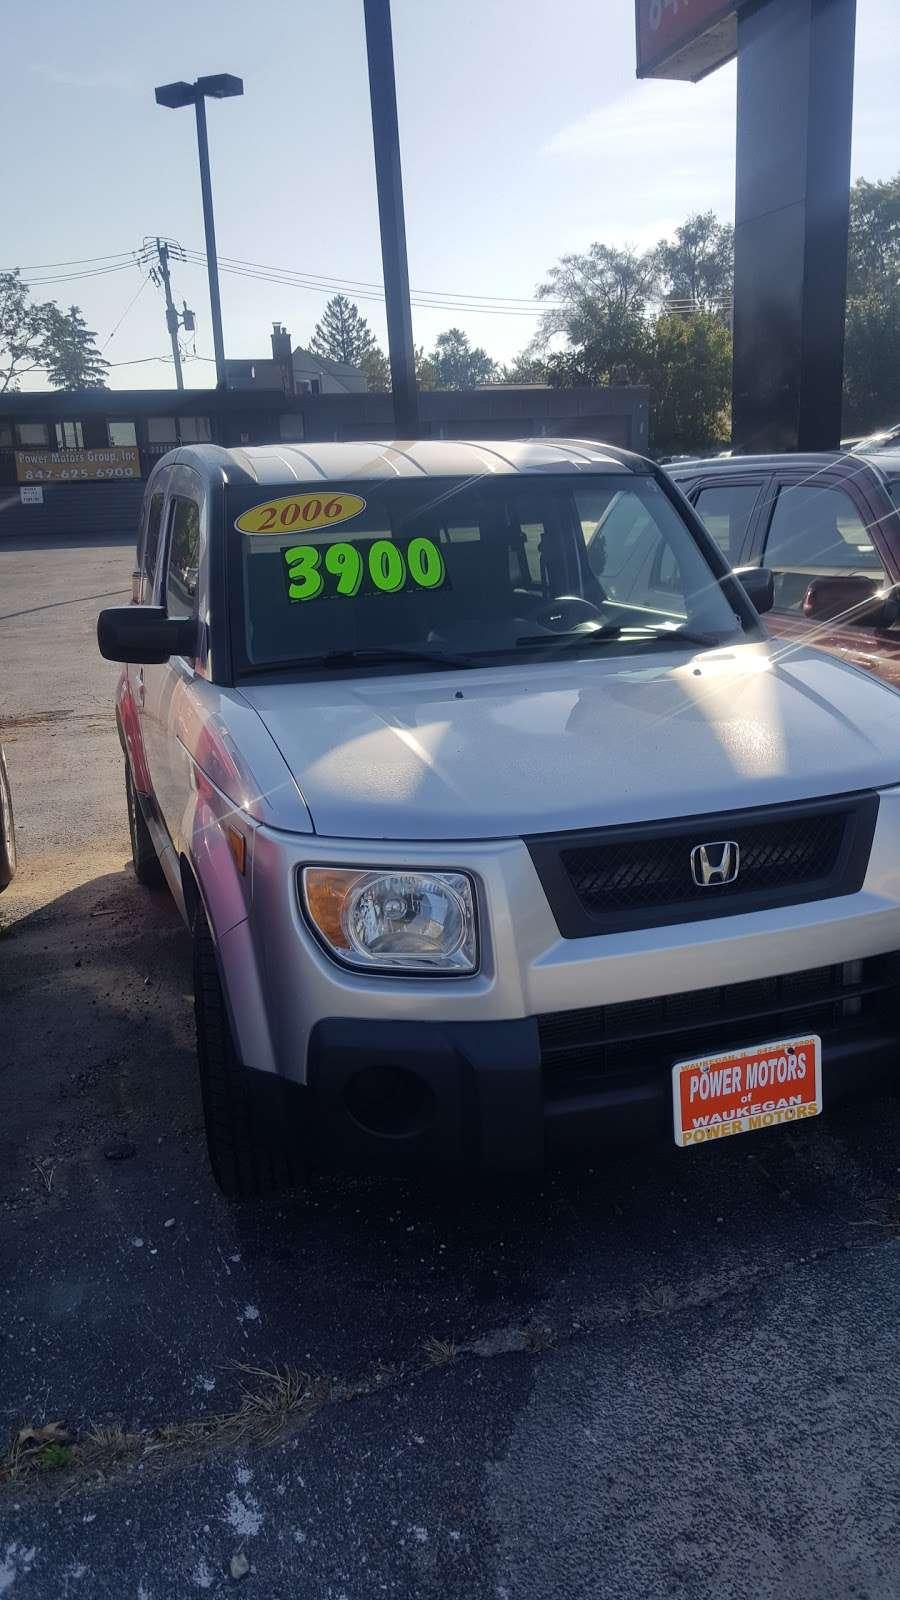 Power Motors Group Inc - car dealer  | Photo 9 of 10 | Address: 2829 Belvidere Rd, Waukegan, IL 60085, USA | Phone: (847) 625-6900